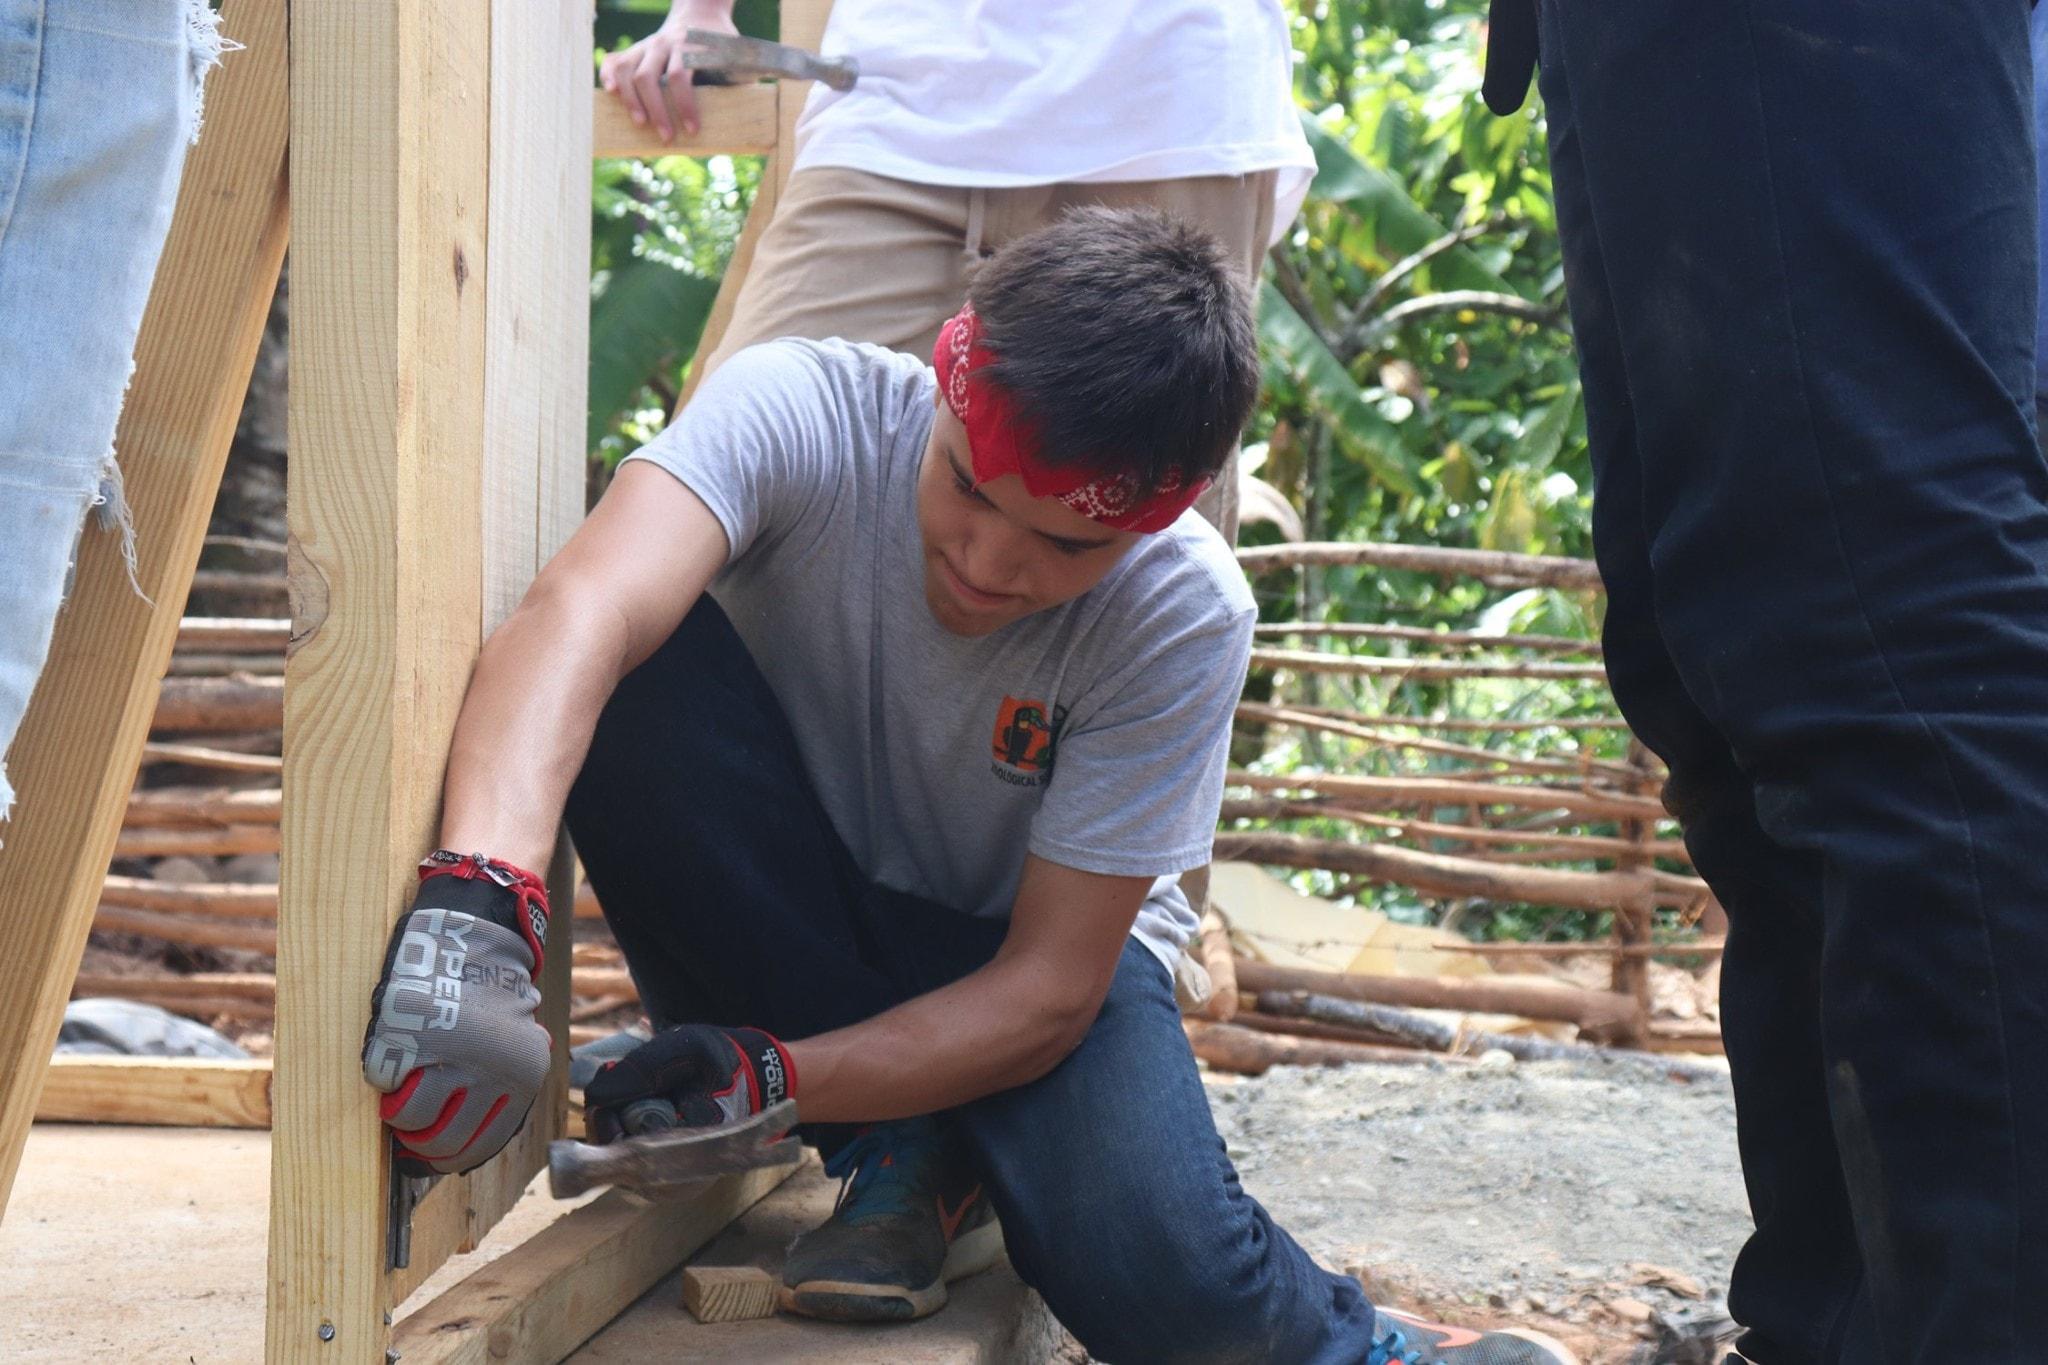 Hammering nails on a ventilated improves pit latrine.jpg